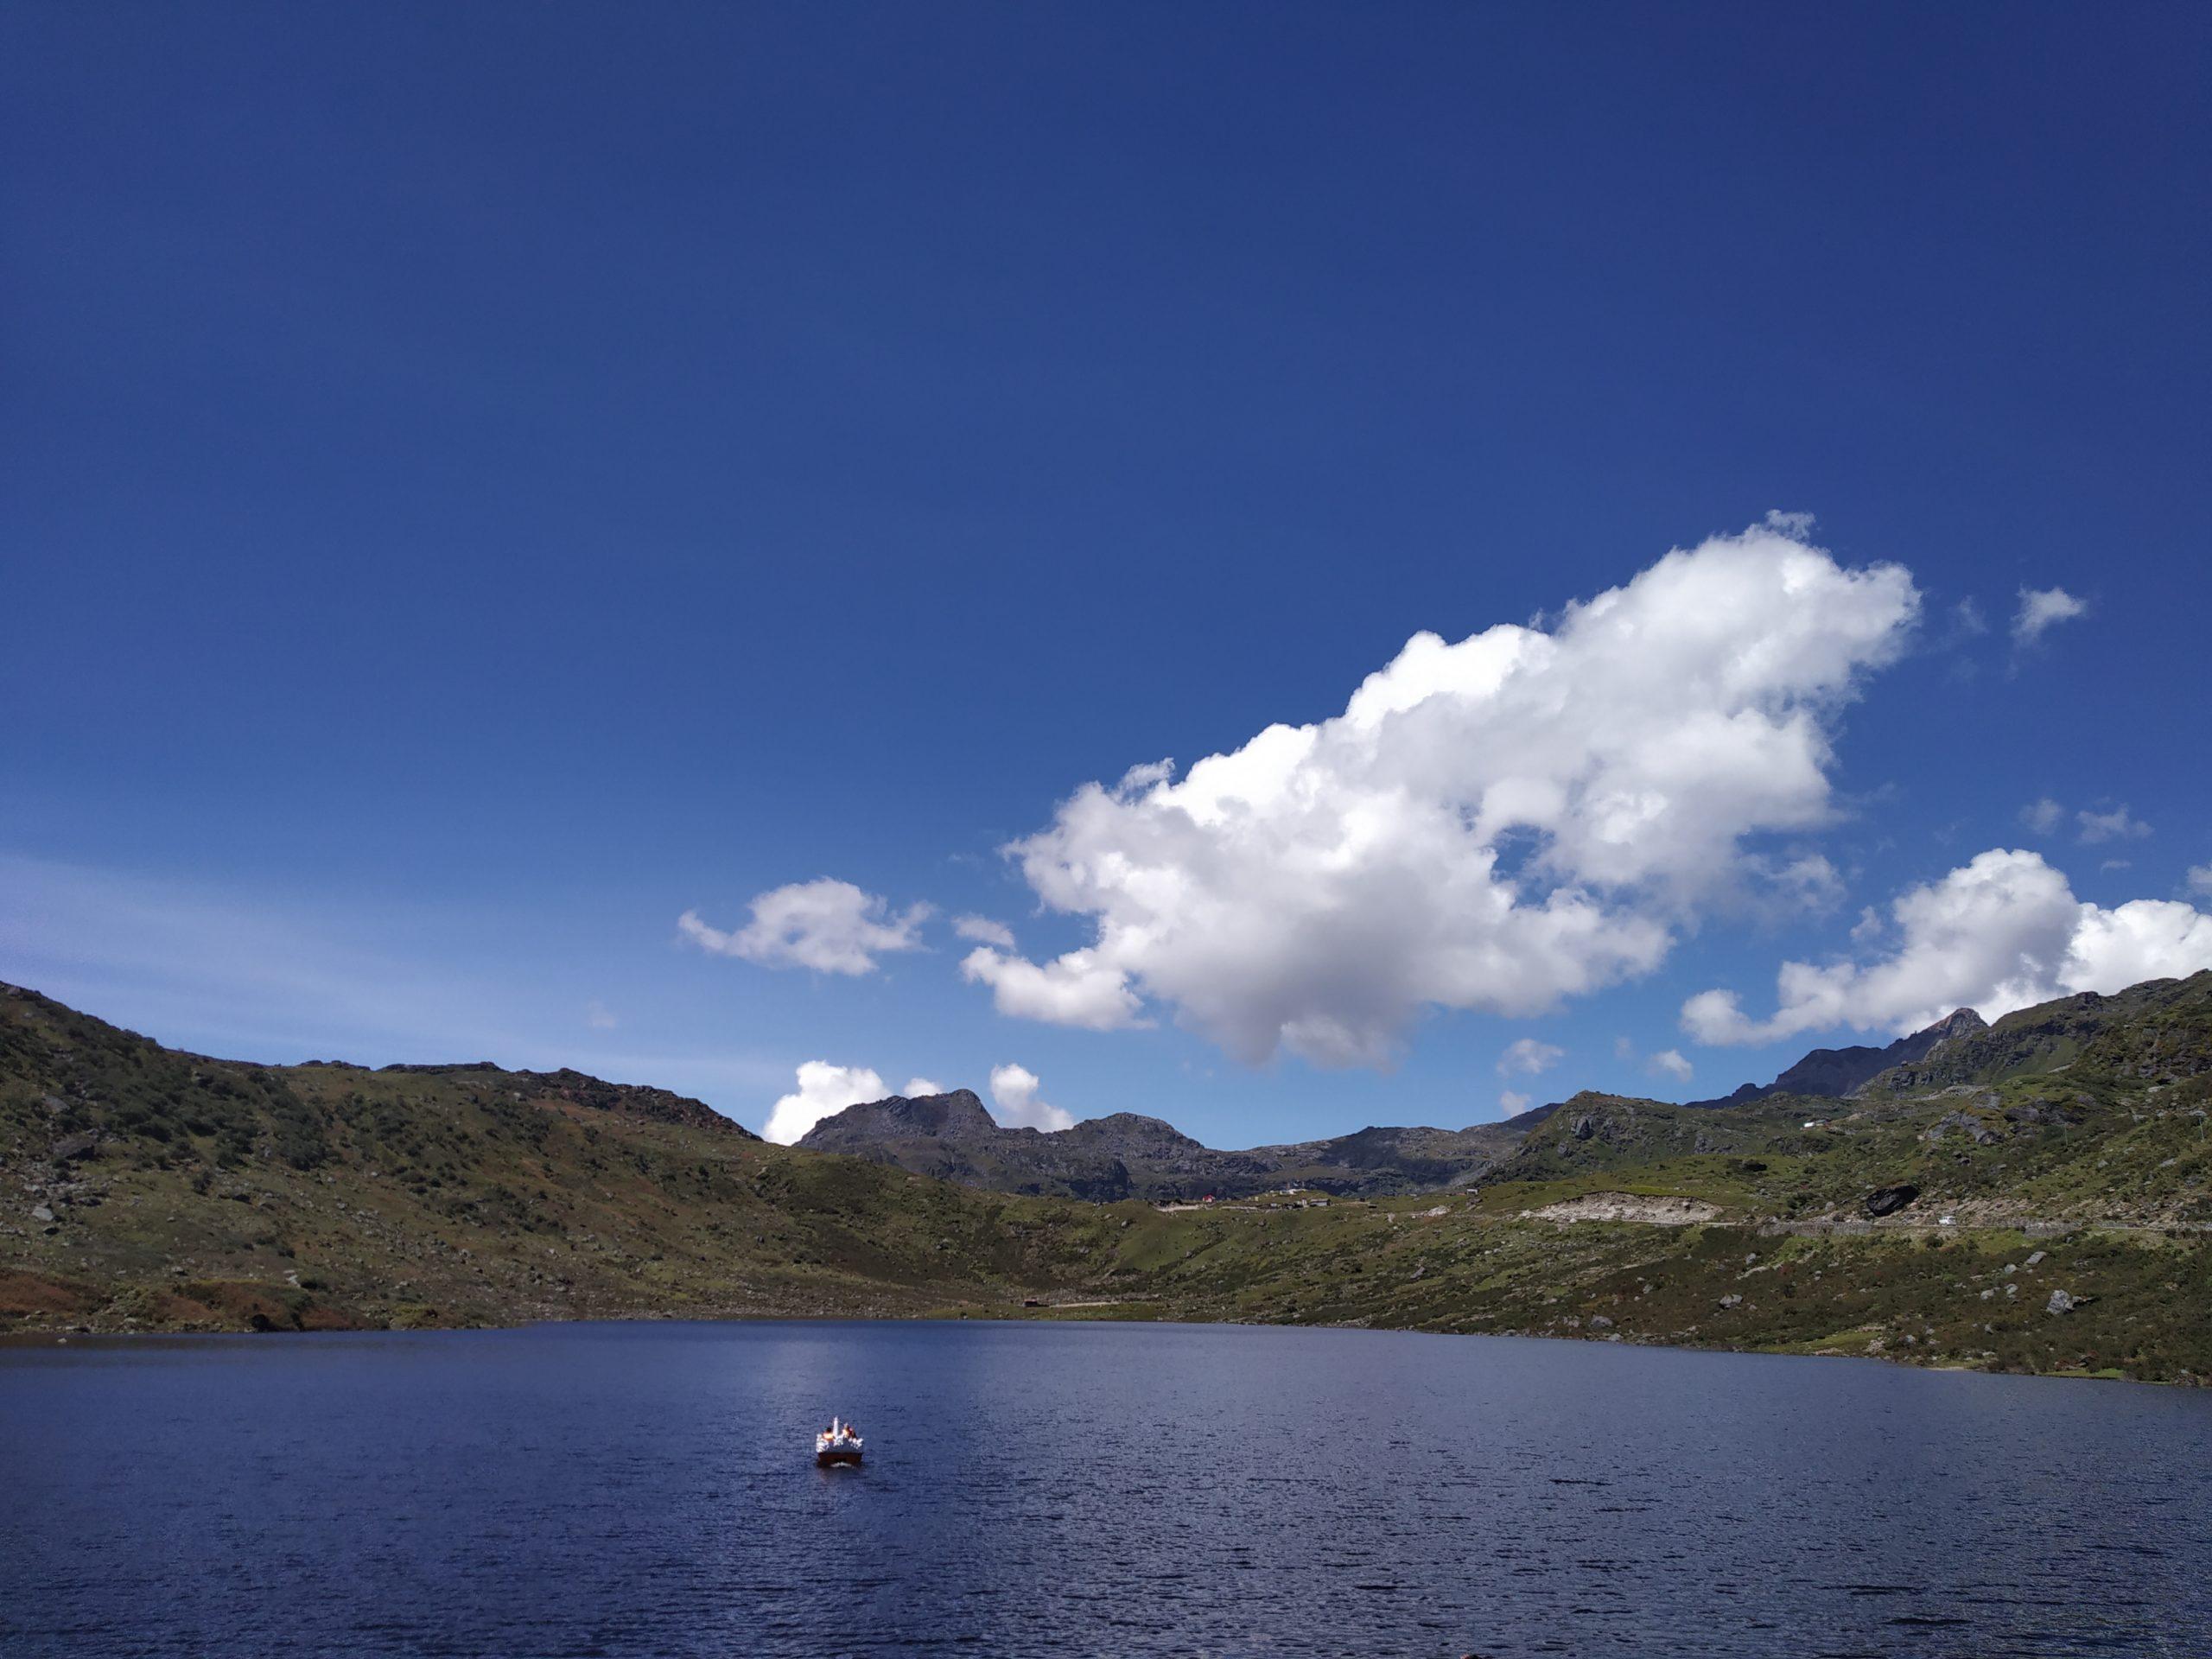 A Lake Scenery on Daytime